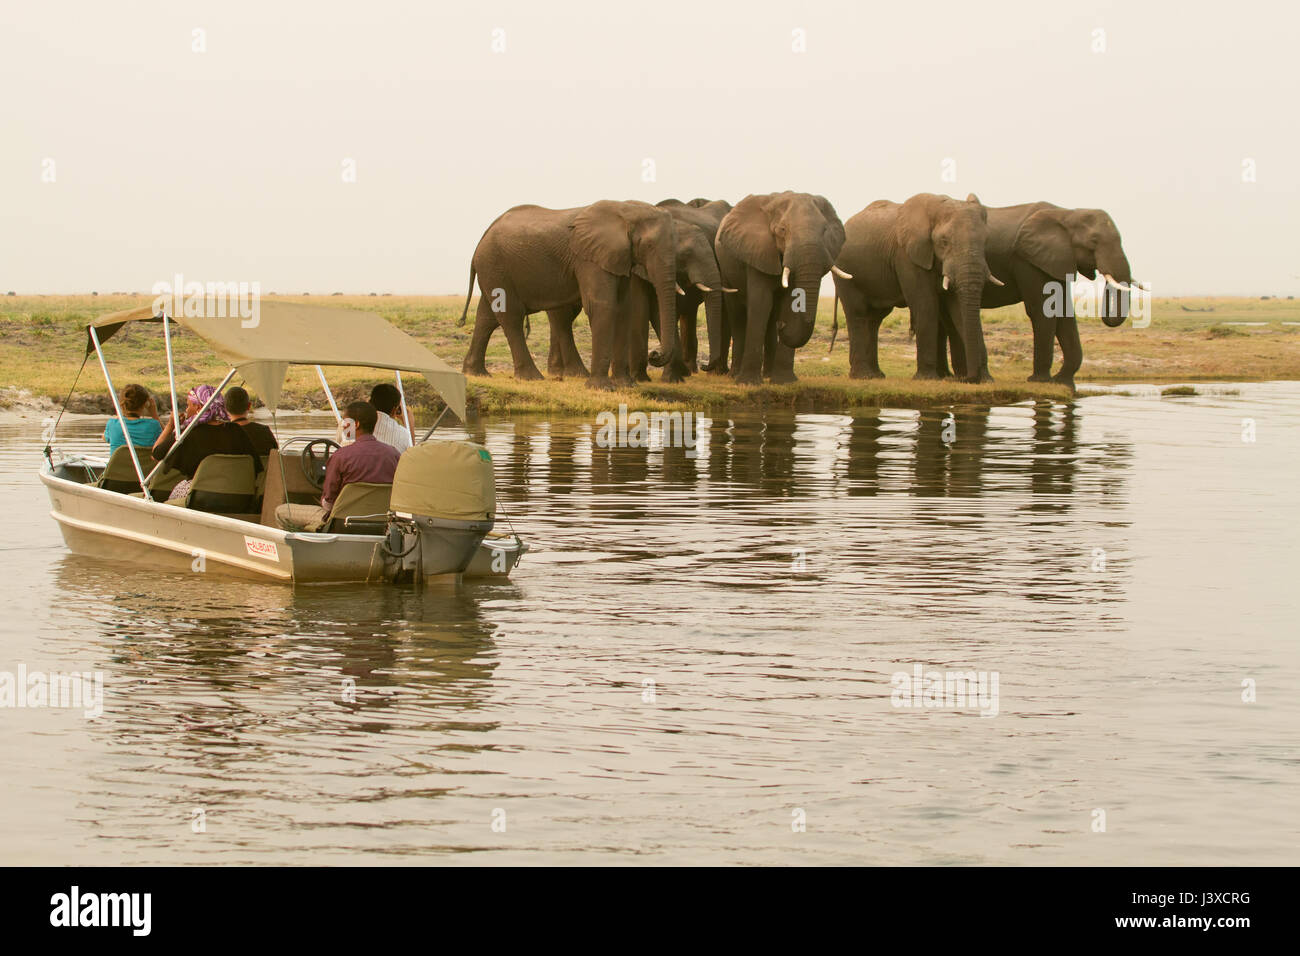 African Elephant herd huddled together, waiting to cross the Chobe River, Chobe National Park, Botswana, Africa. - Stock Image